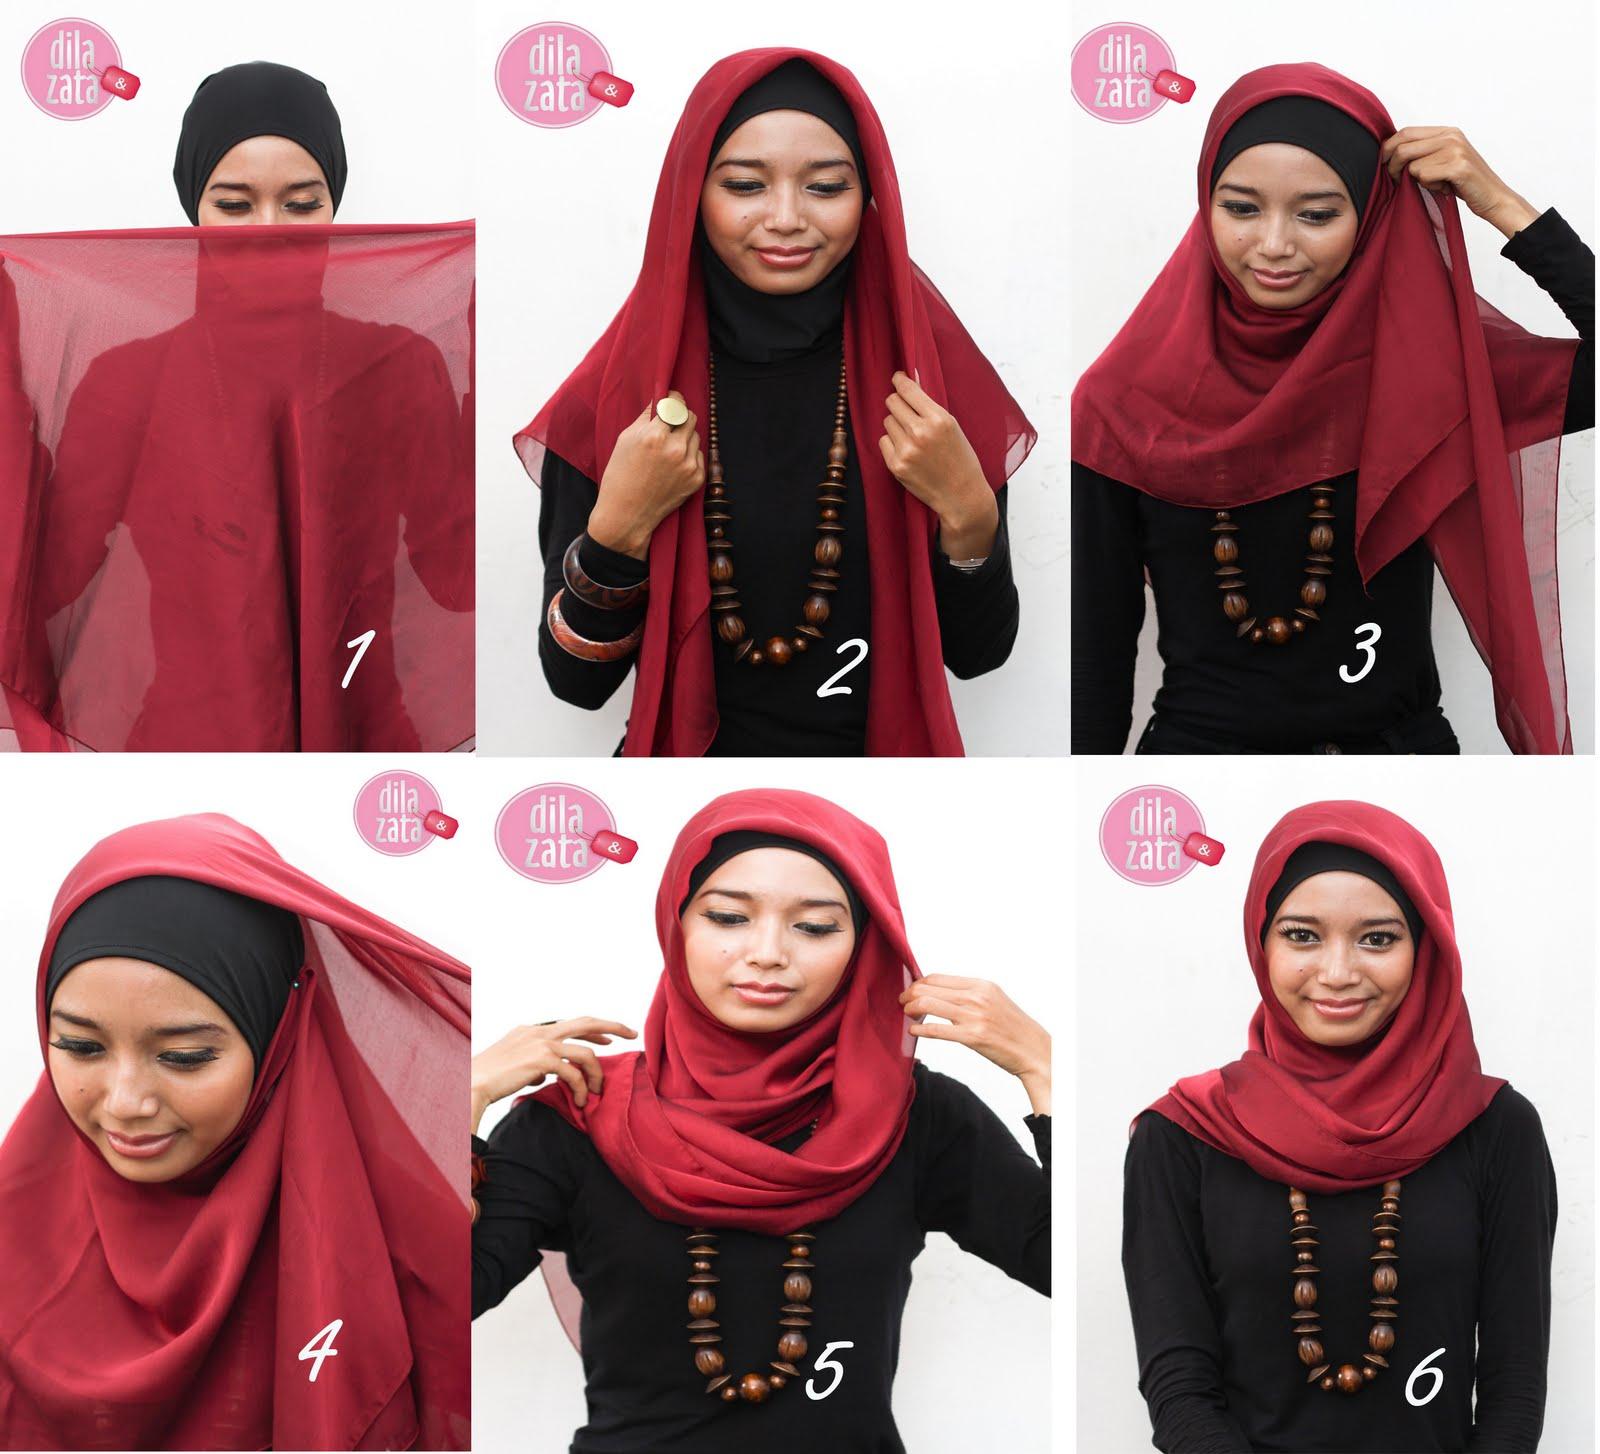 82 Gambar Menarik Tutorial Hijab Segi Empat Buat Kerja Sayang